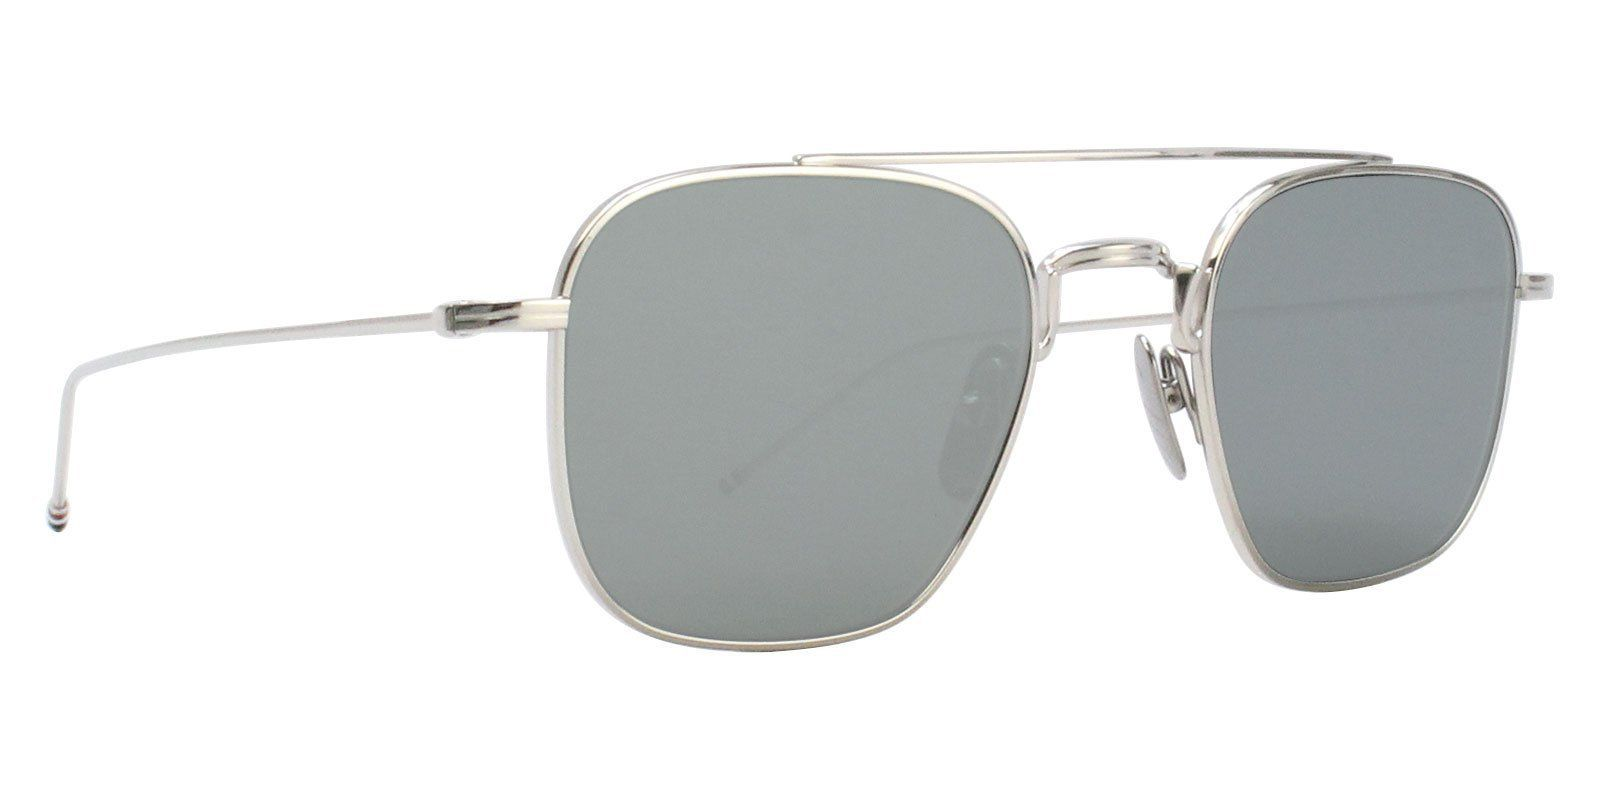 637abb759830 Thom Browne - TBS907-50 Silver - Silver sunglasses